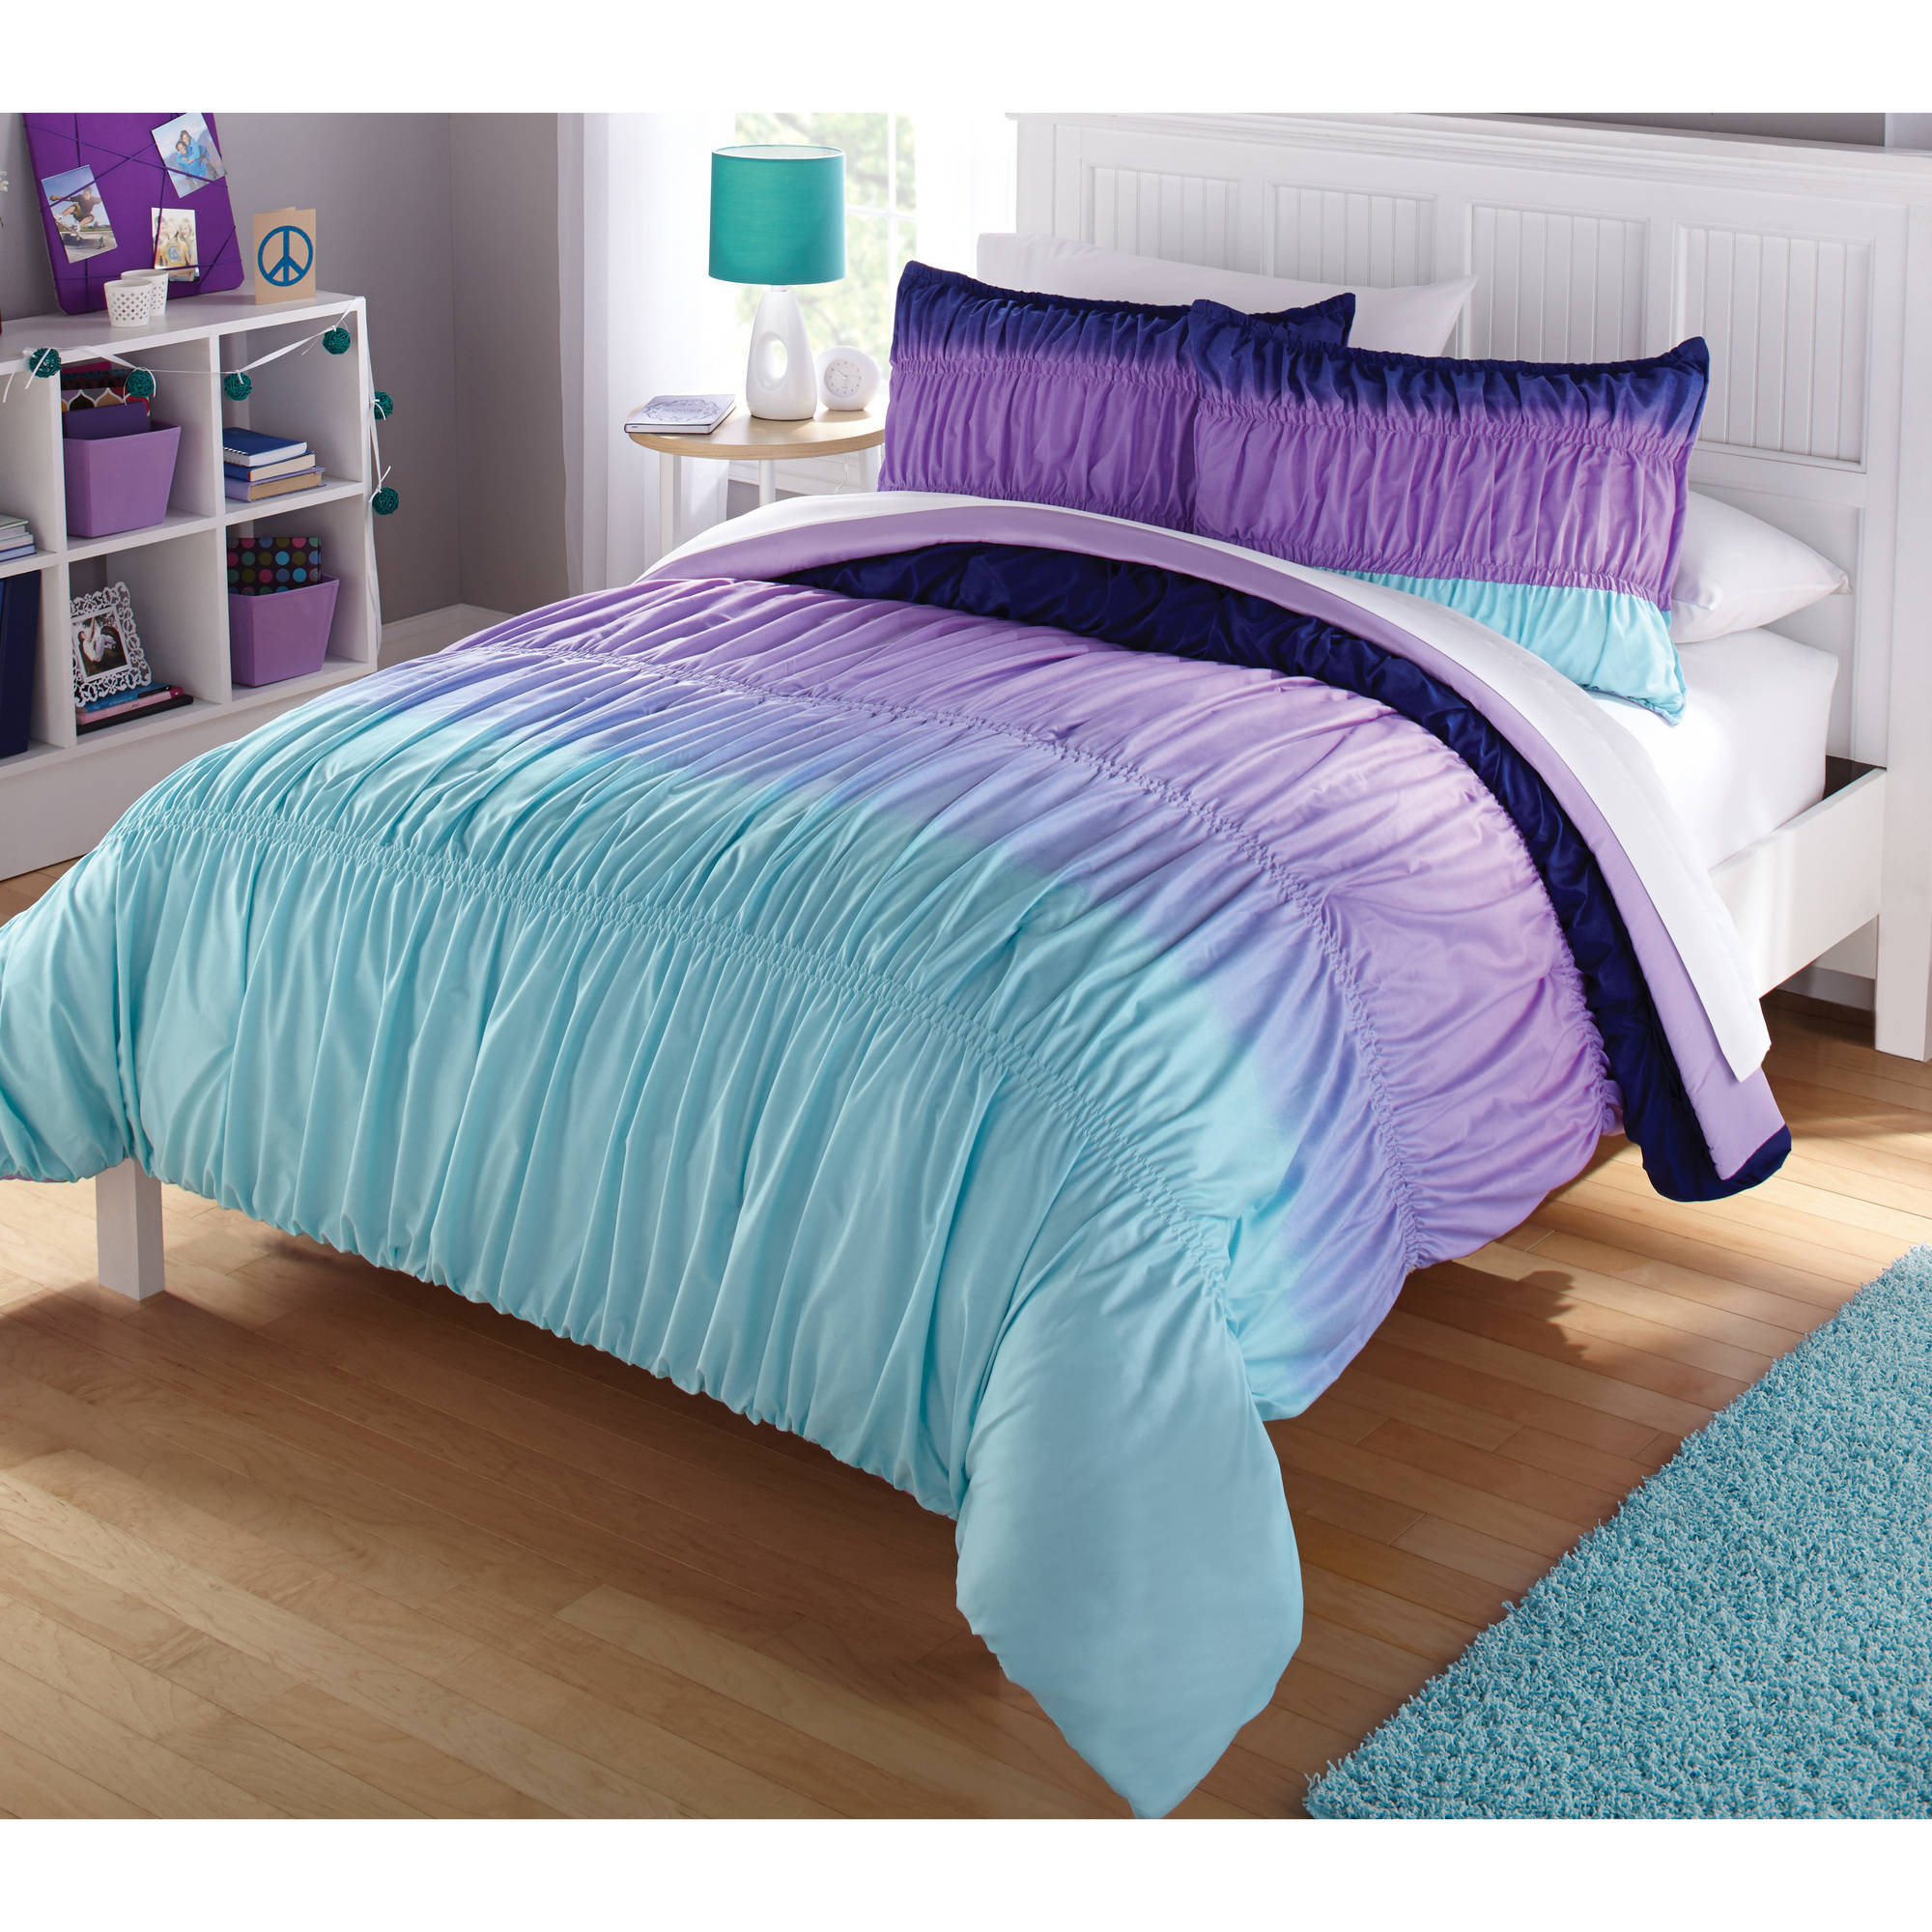 Latitude ombre ruched reversible complete bedding set purple walmart com